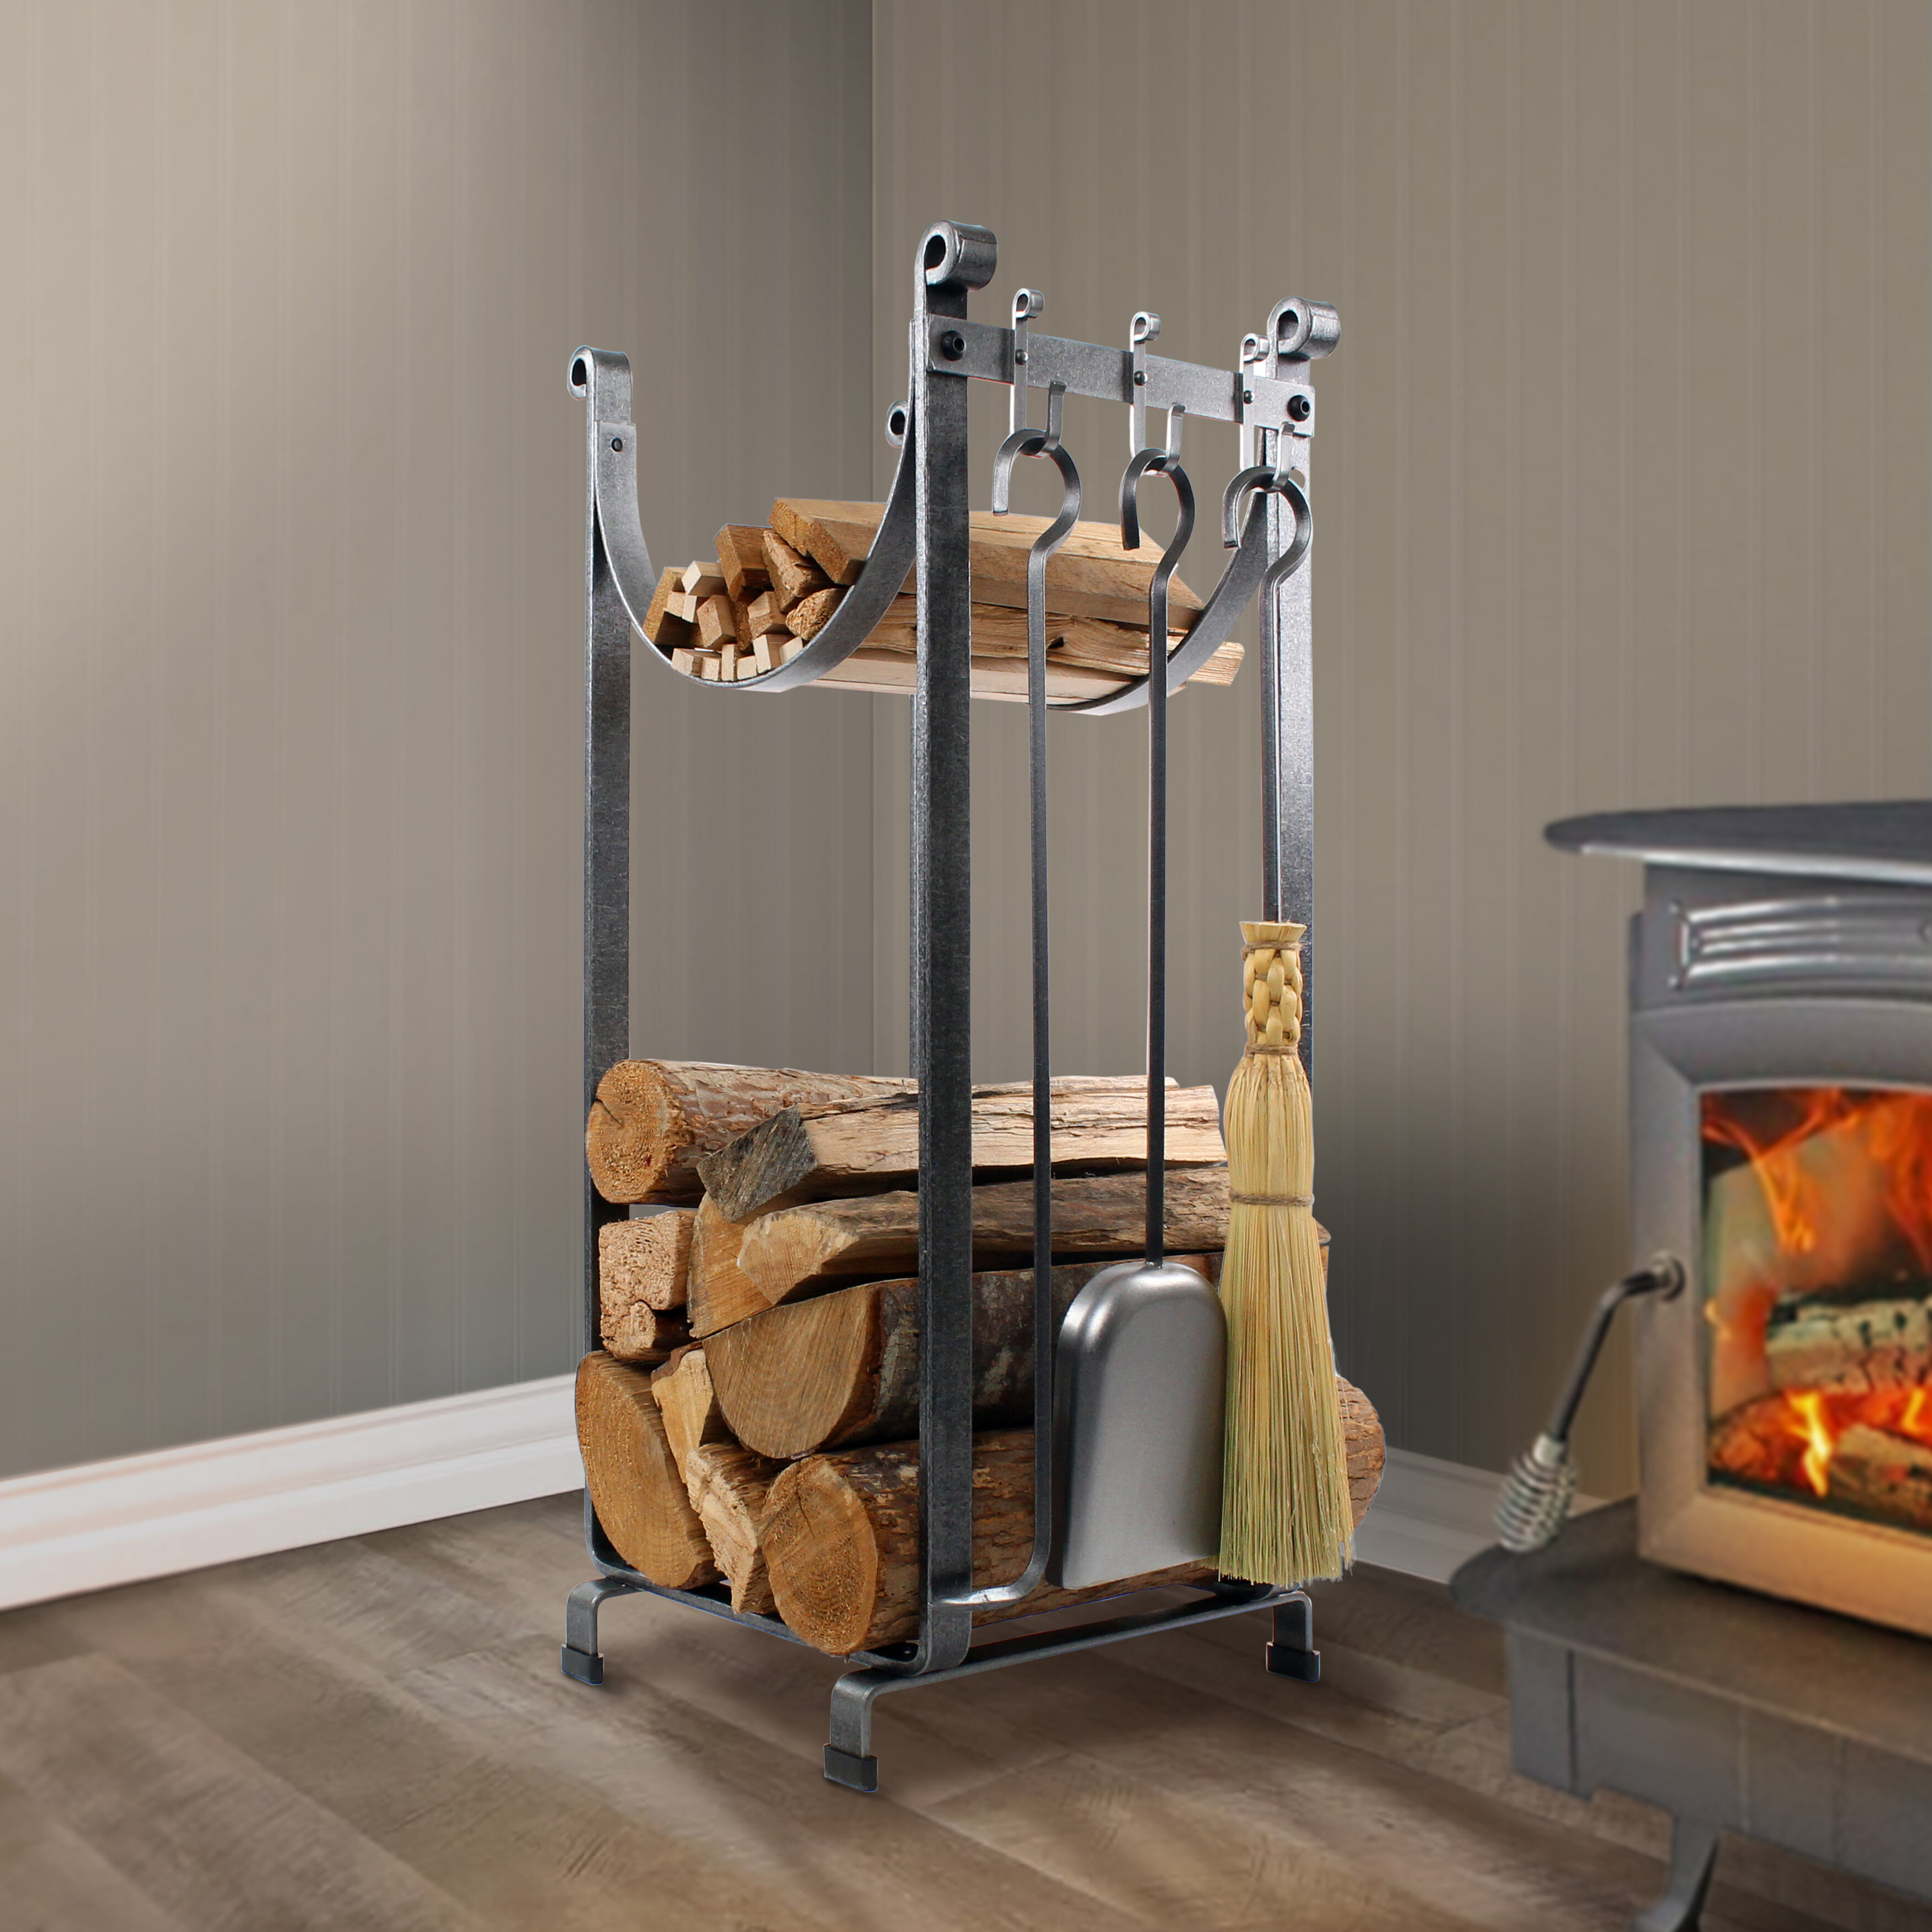 Steel Fireplace Tool Set With Log Rack